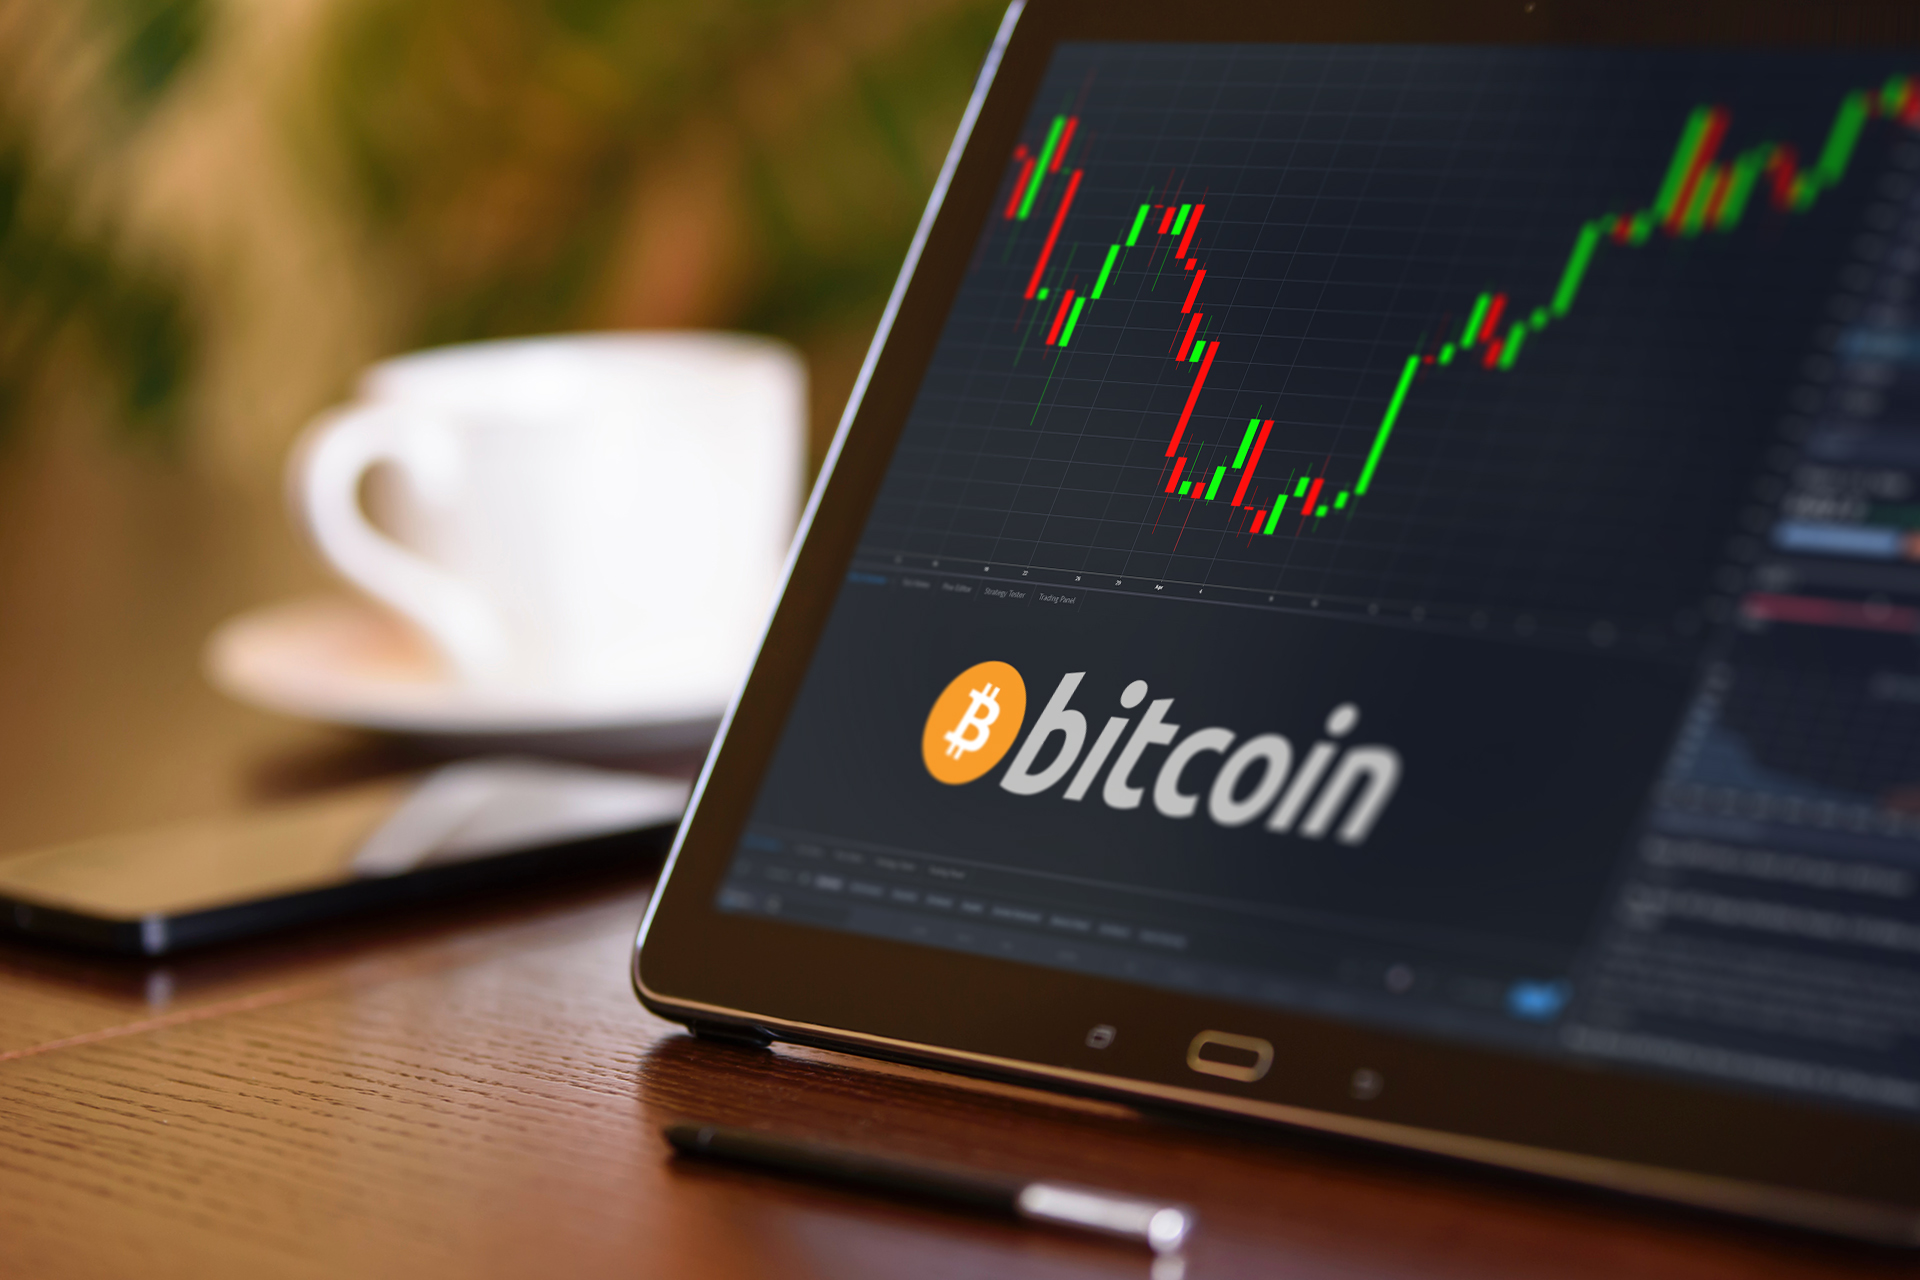 Meddig juthat el a bitcoin árfolyama? - Rakéta